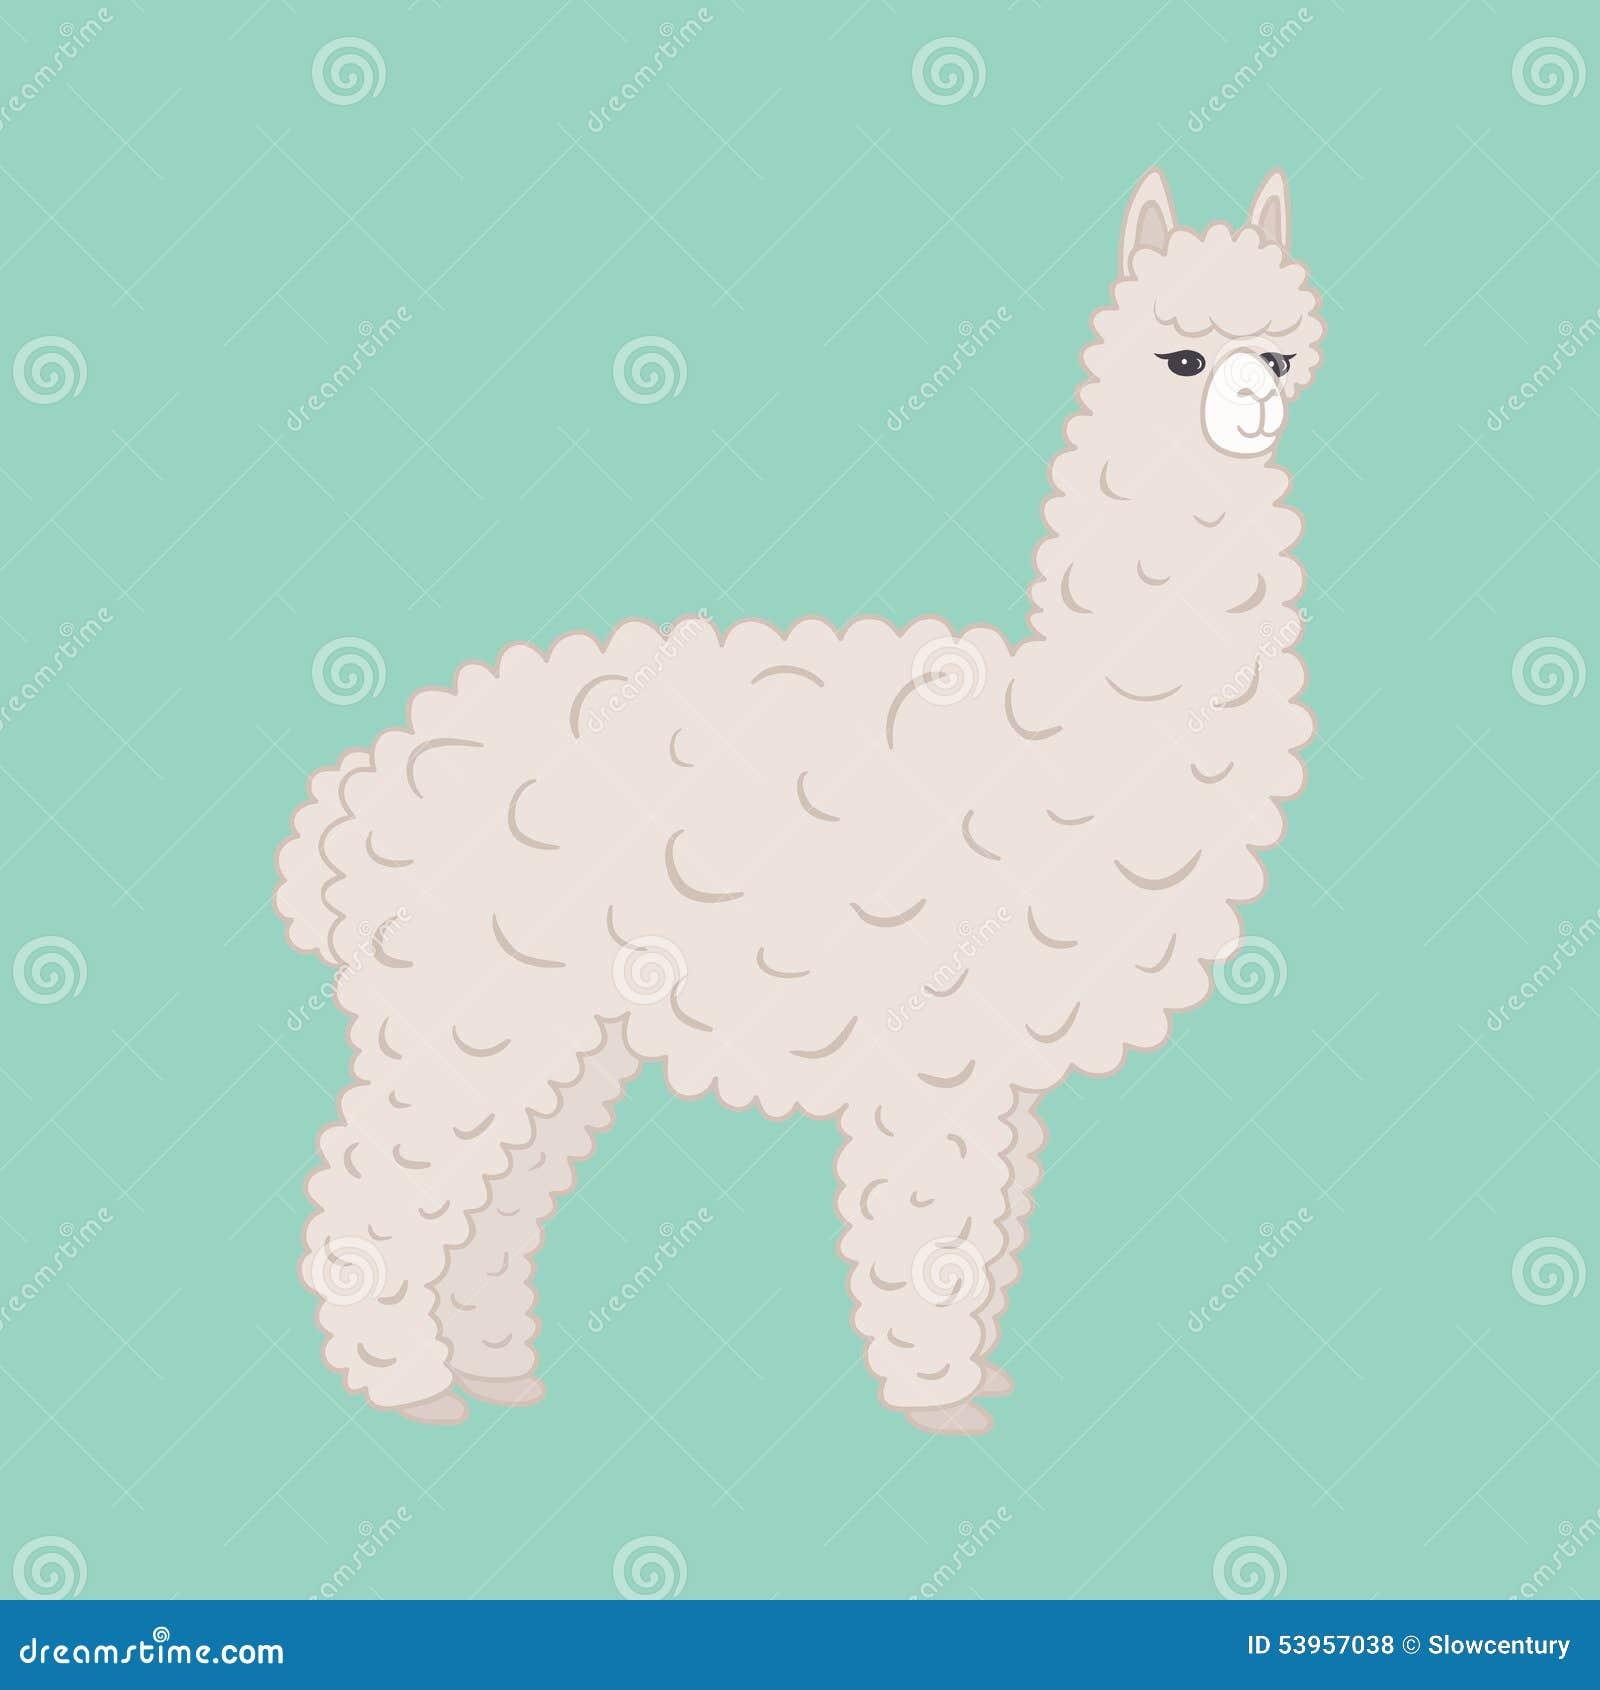 Cute Furry Alpaca Stock Vector - Image: 53957038